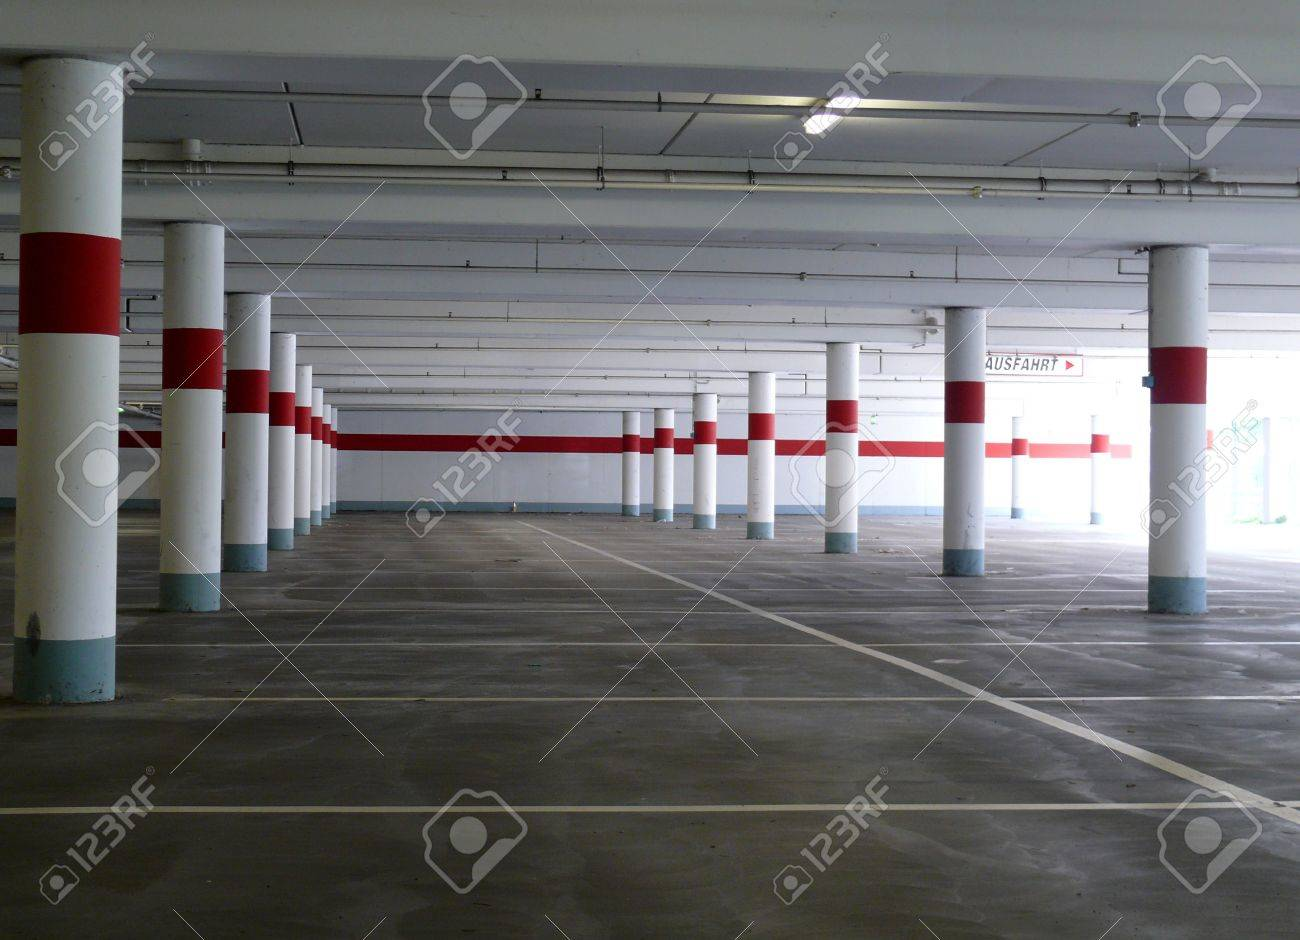 Parking deck Stock Photo - 7627216